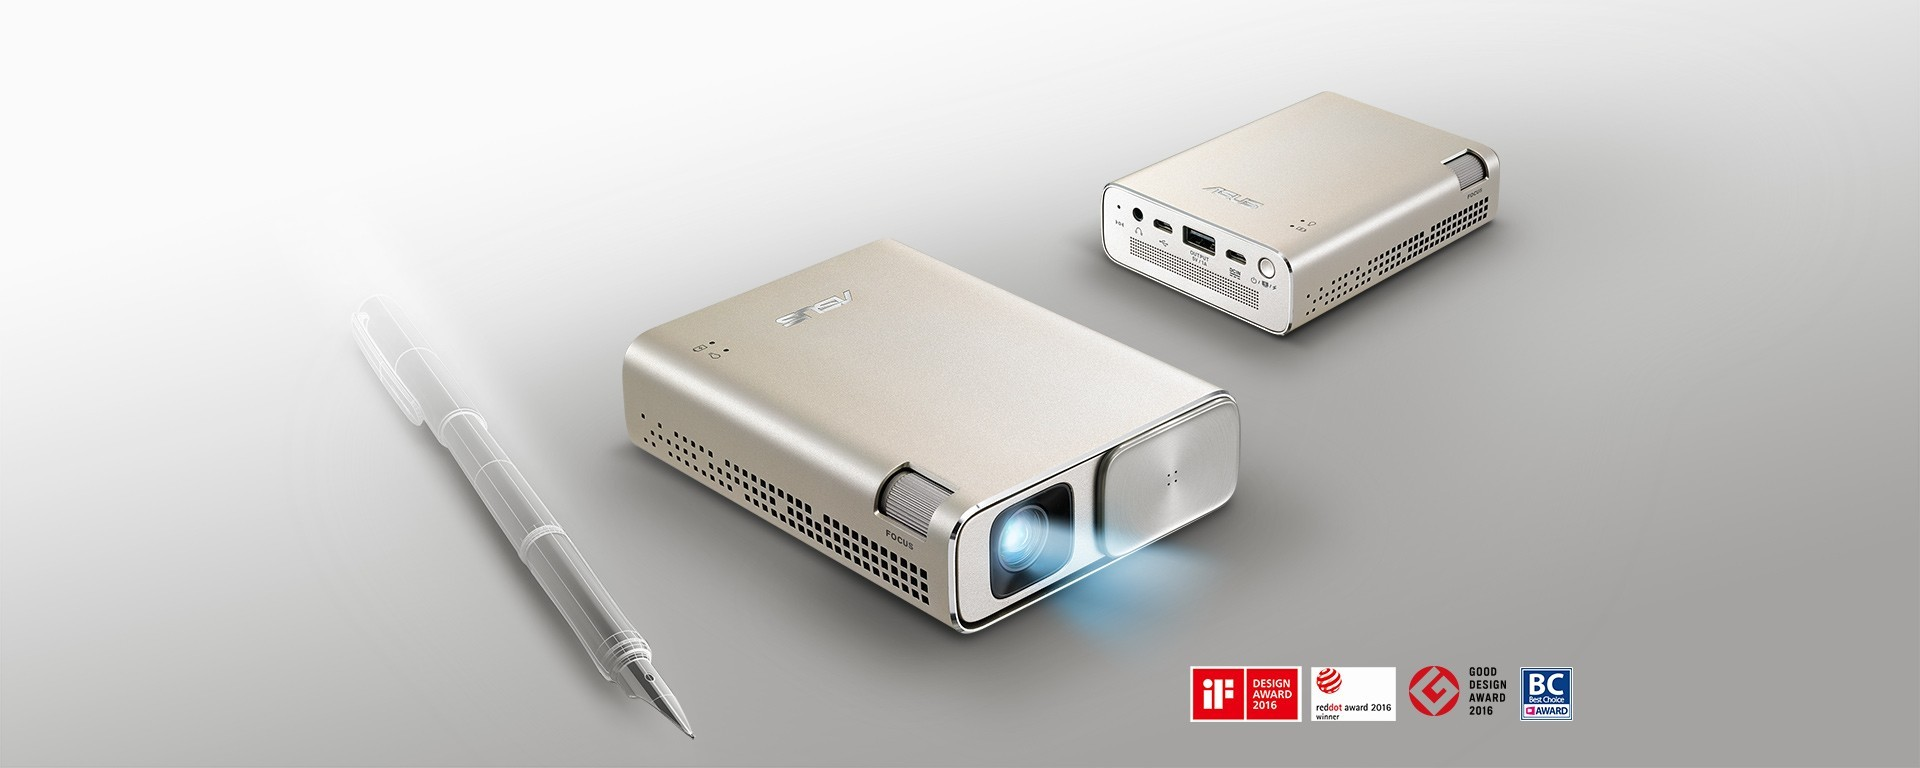 ASUS ra mắt máy chiếu bỏ túi ZenBeam Go E1Z